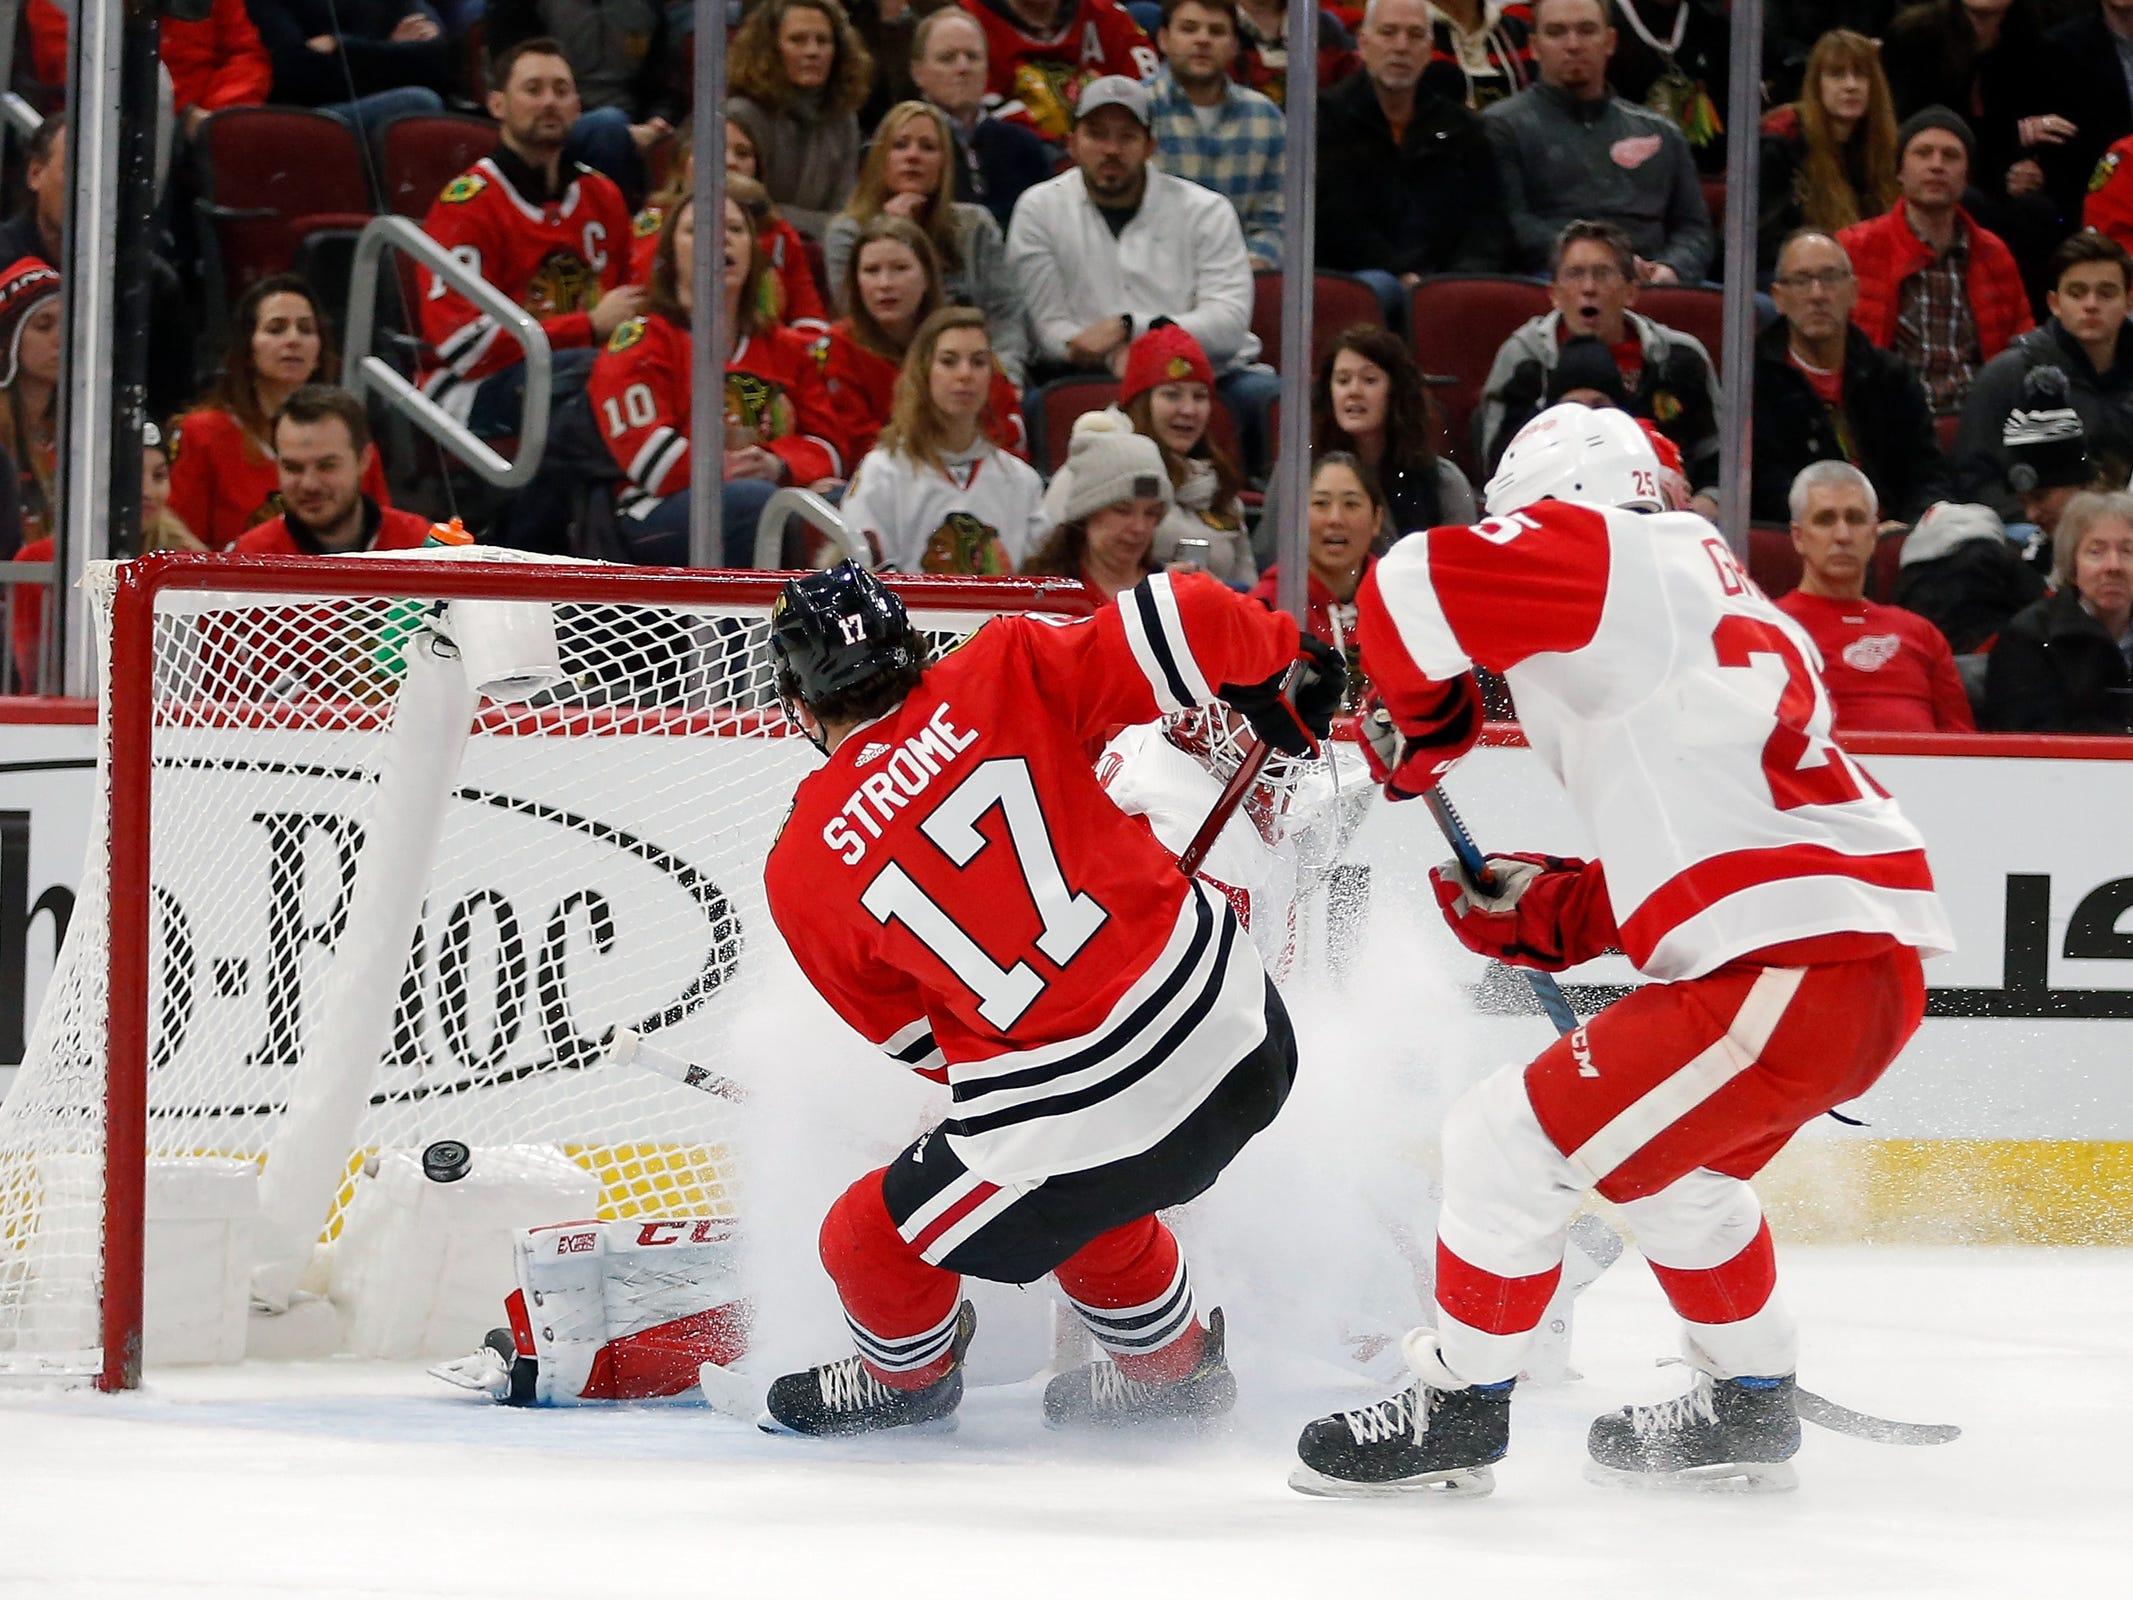 Chicago Blackhawks center Dylan Strome scores against Detroit Red Wings goaltender Jonathan Bernier during the first period at United Center, Feb. 10, 2019.